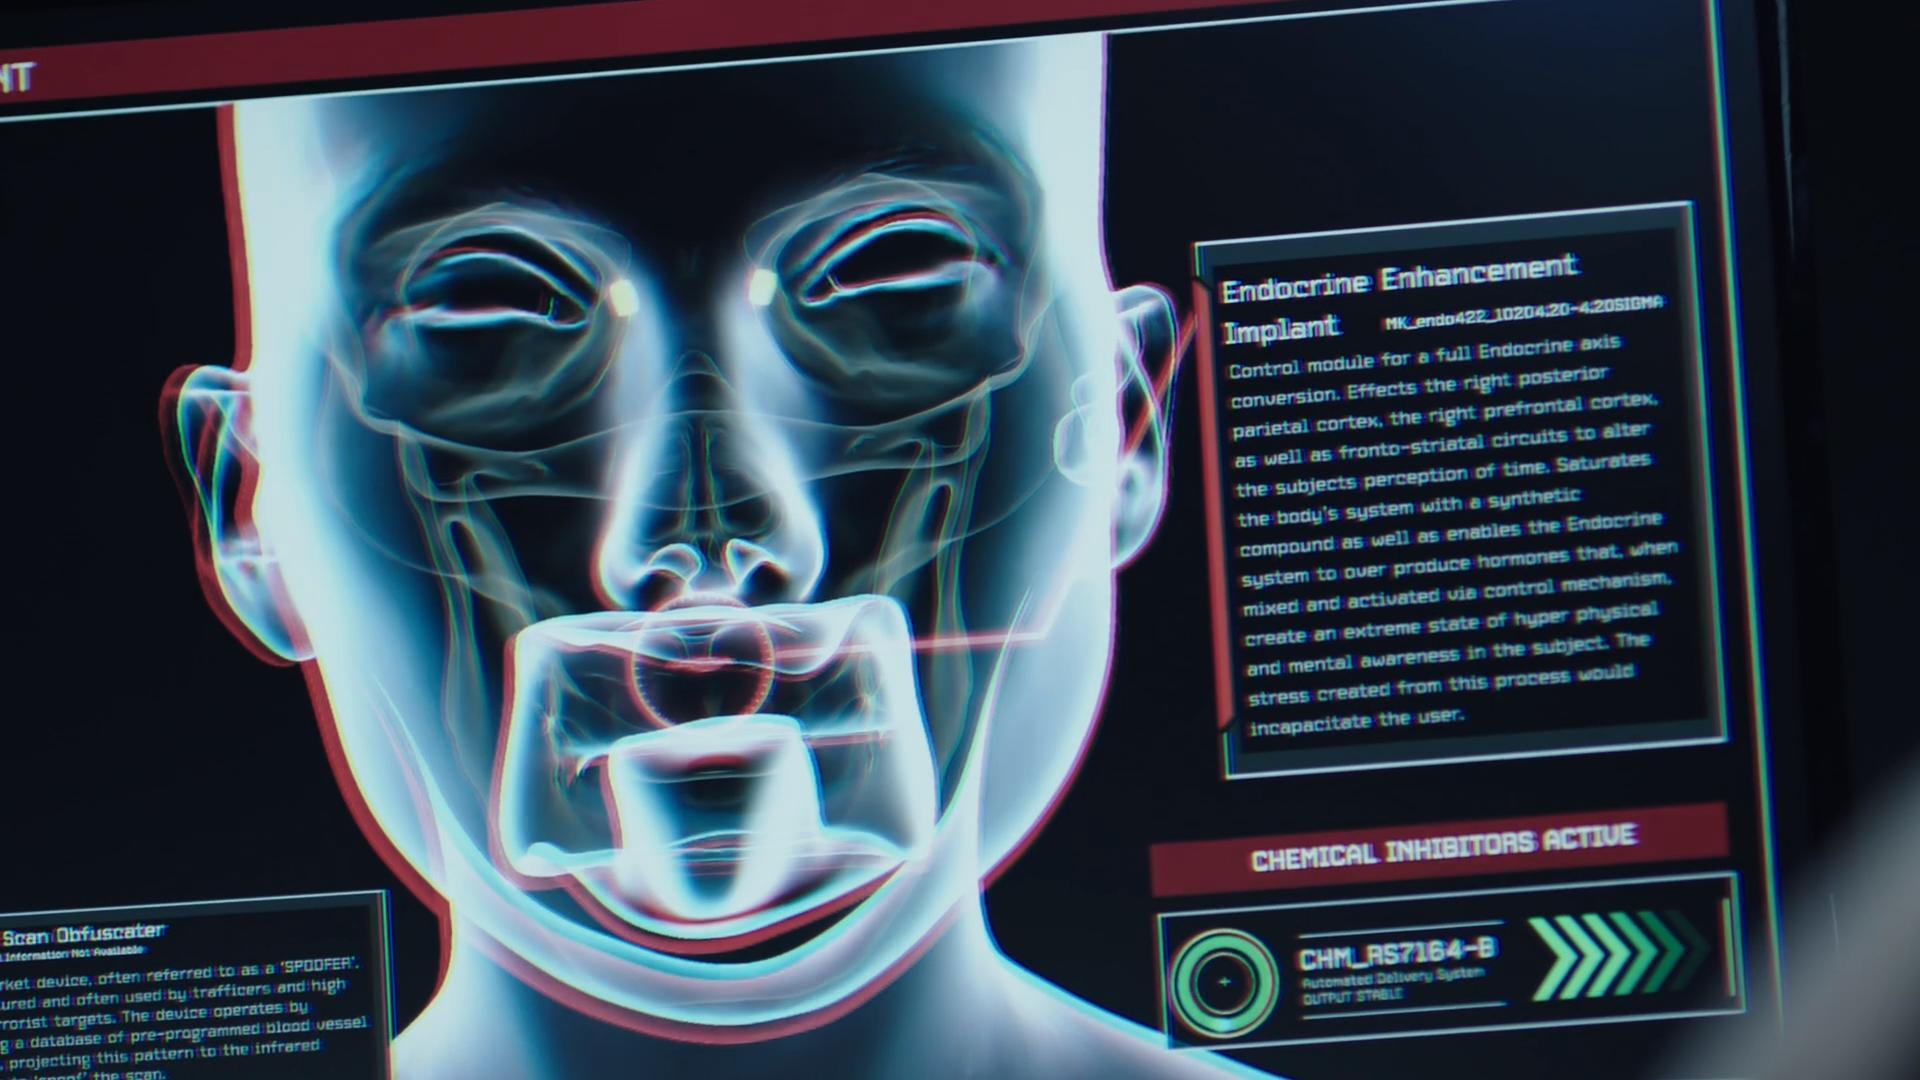 Endocrine Enhancement Implant